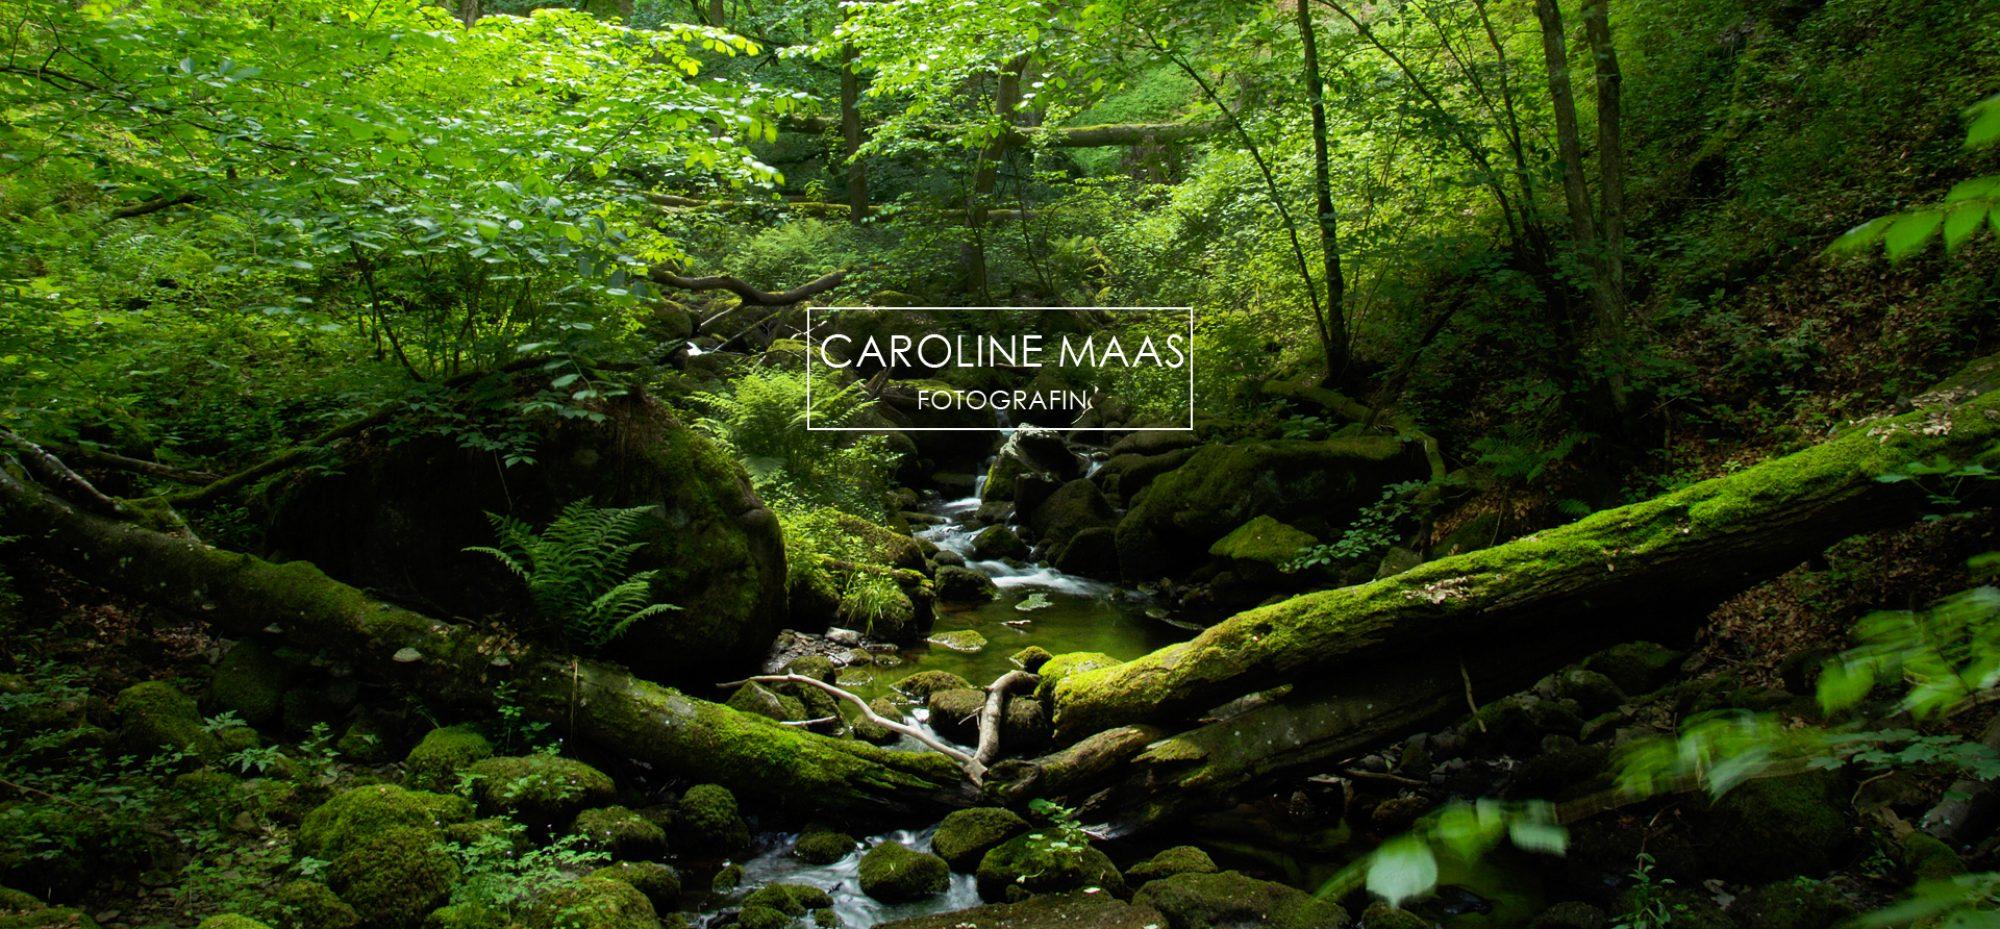 Caroline Maas Fotografie